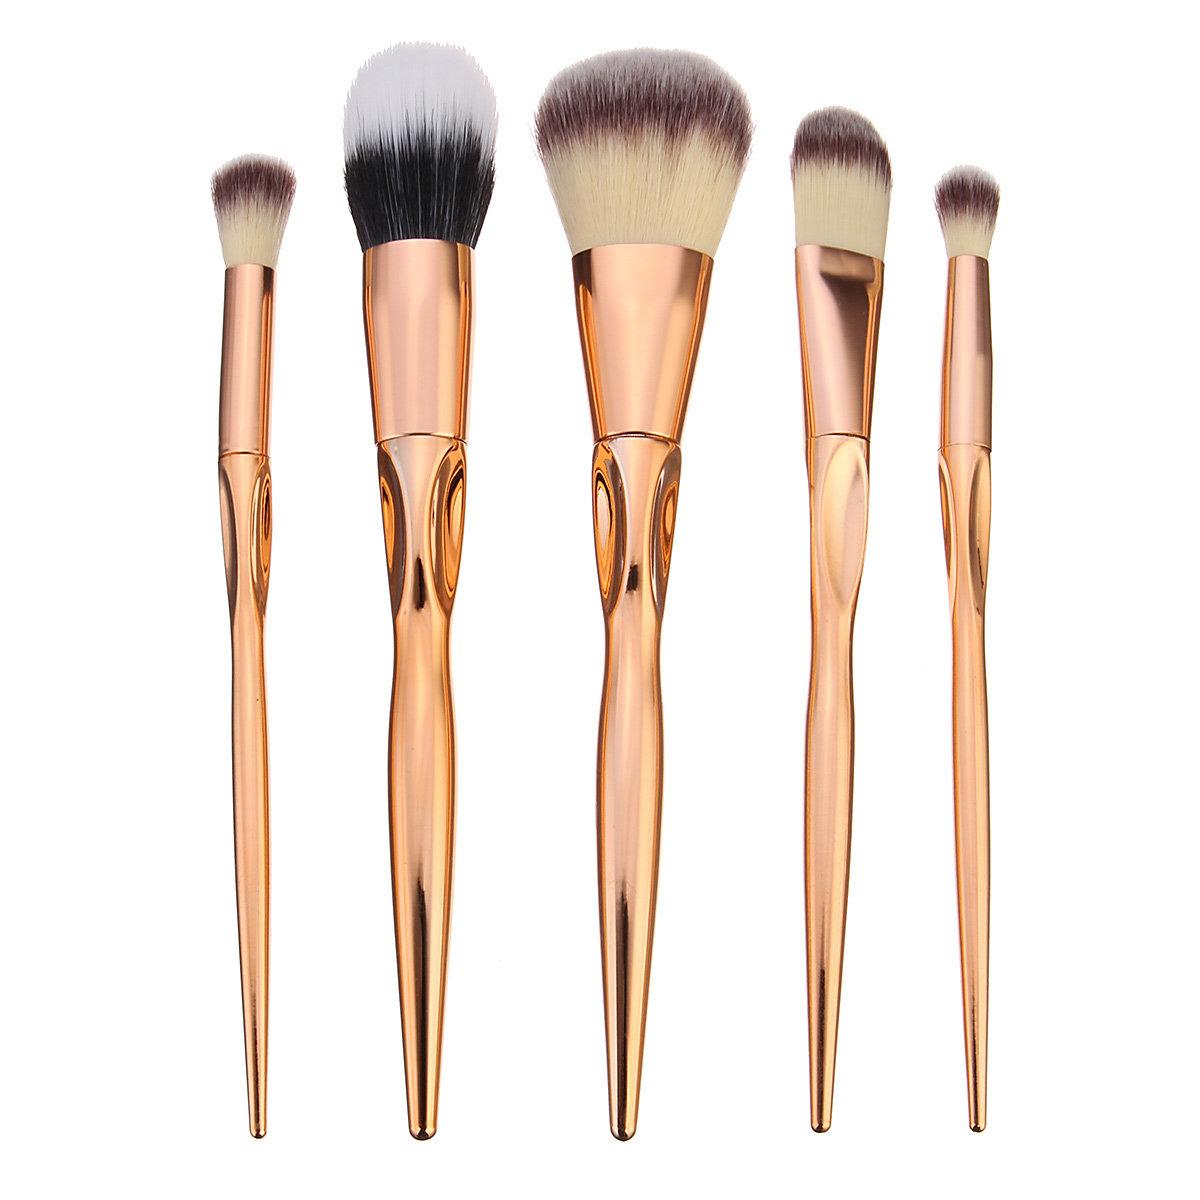 5Pcs Soft Makeup Brushes Kit Golden Cosmetics Tools Eye Shadow Lip Blending Blush Brush